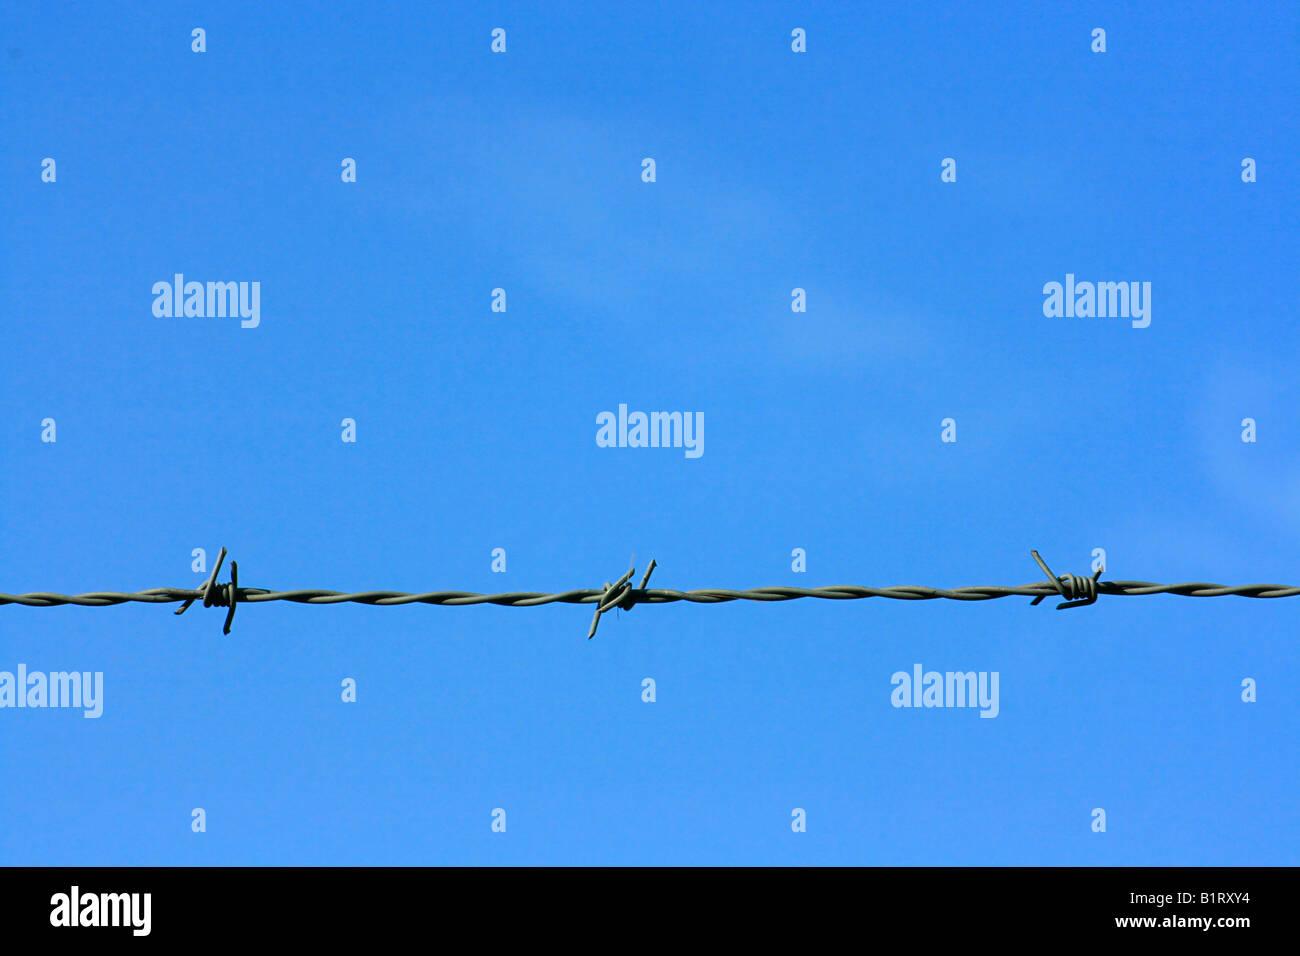 Bleu ciel et les barbelés, barbedwire Photo Stock